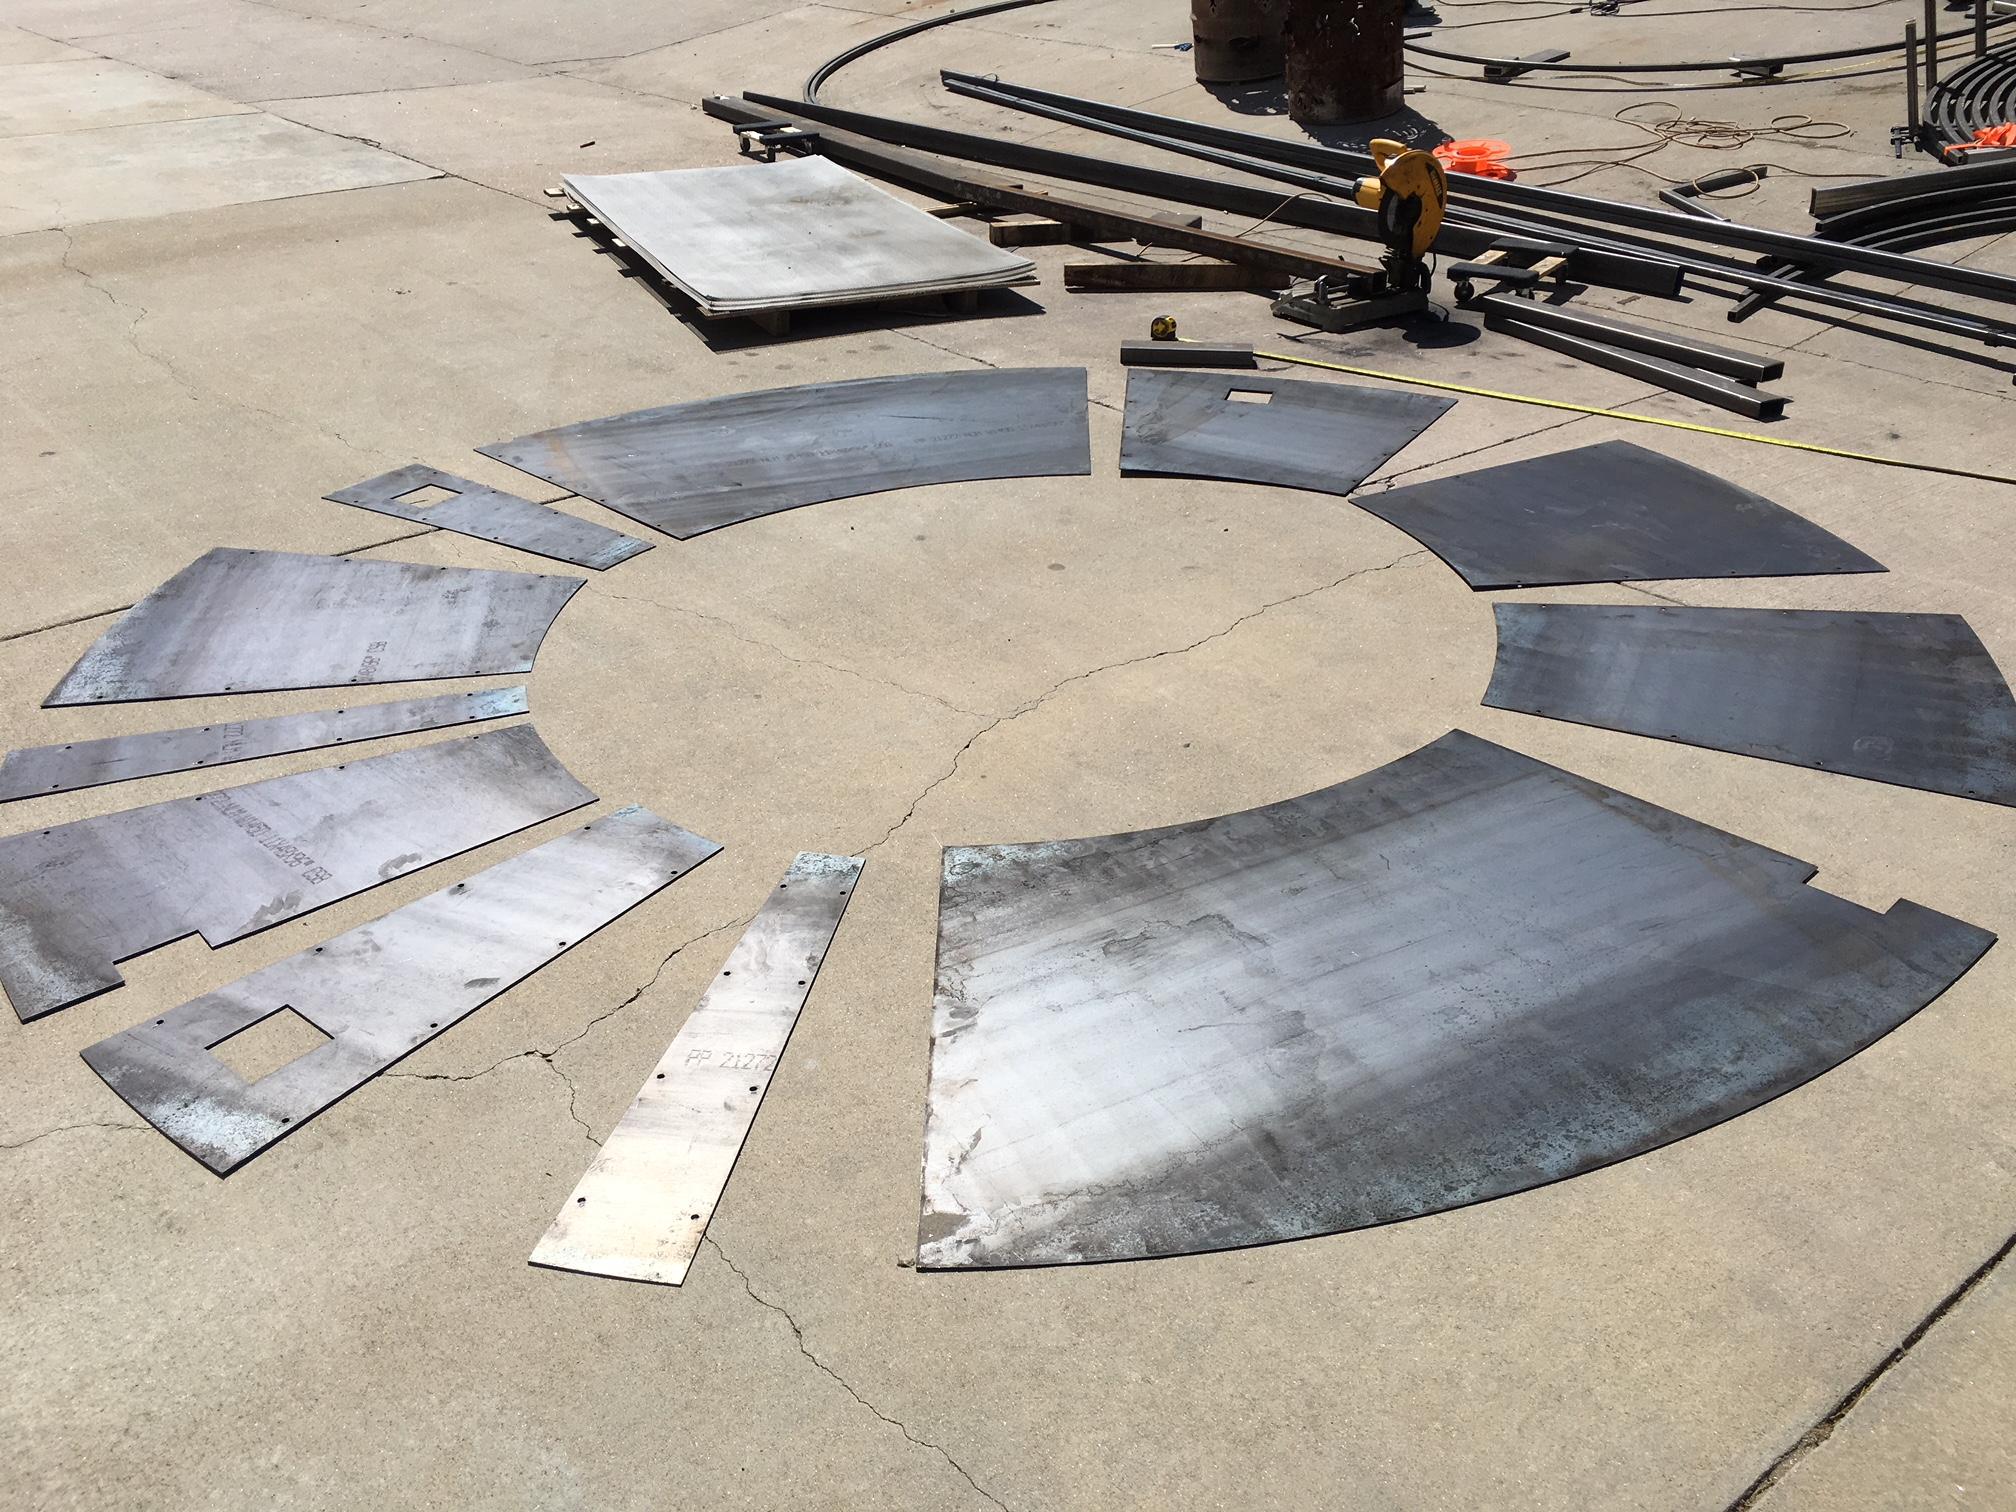 Matthew Geller_Springs_Colorado Springs_Public Art Services_J Grant Projects_4.JPG